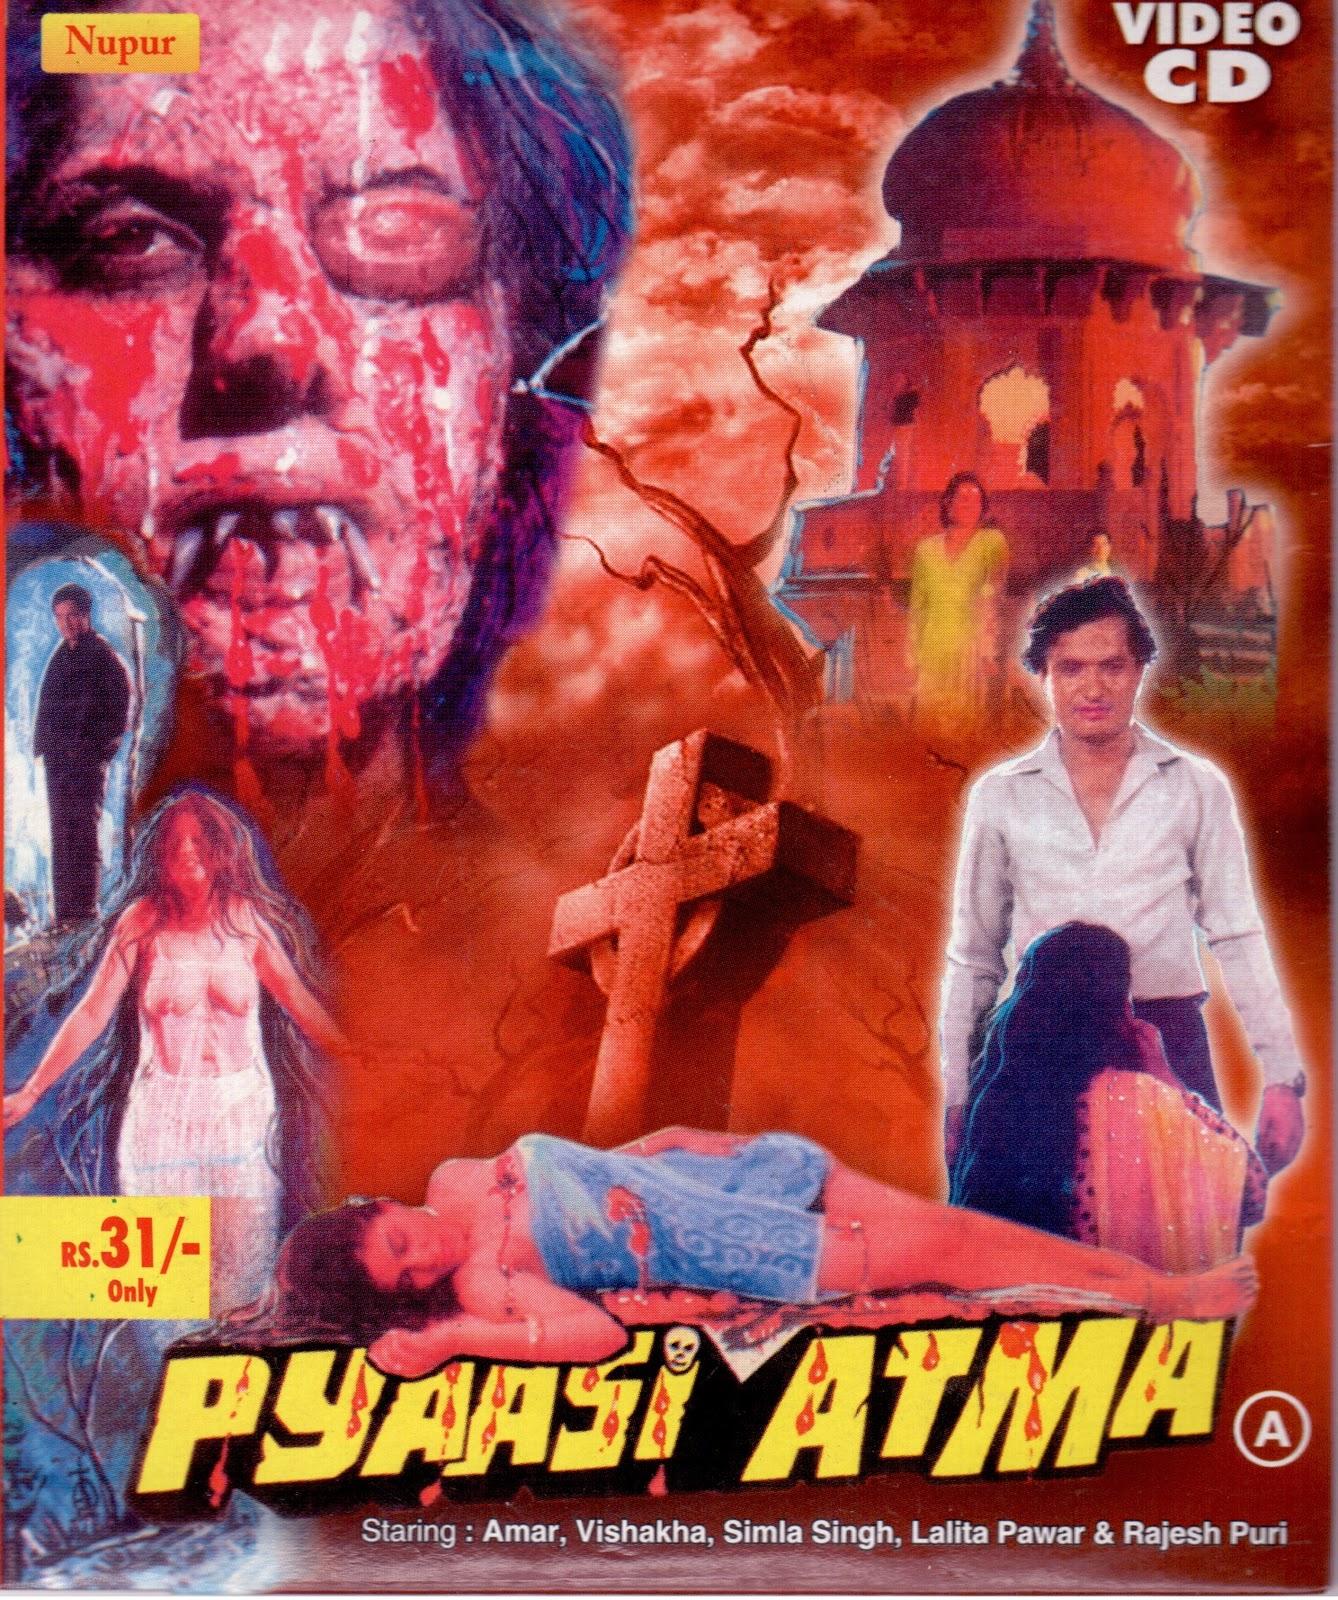 Bollywood Horror - Poster - Pyaasi Atma